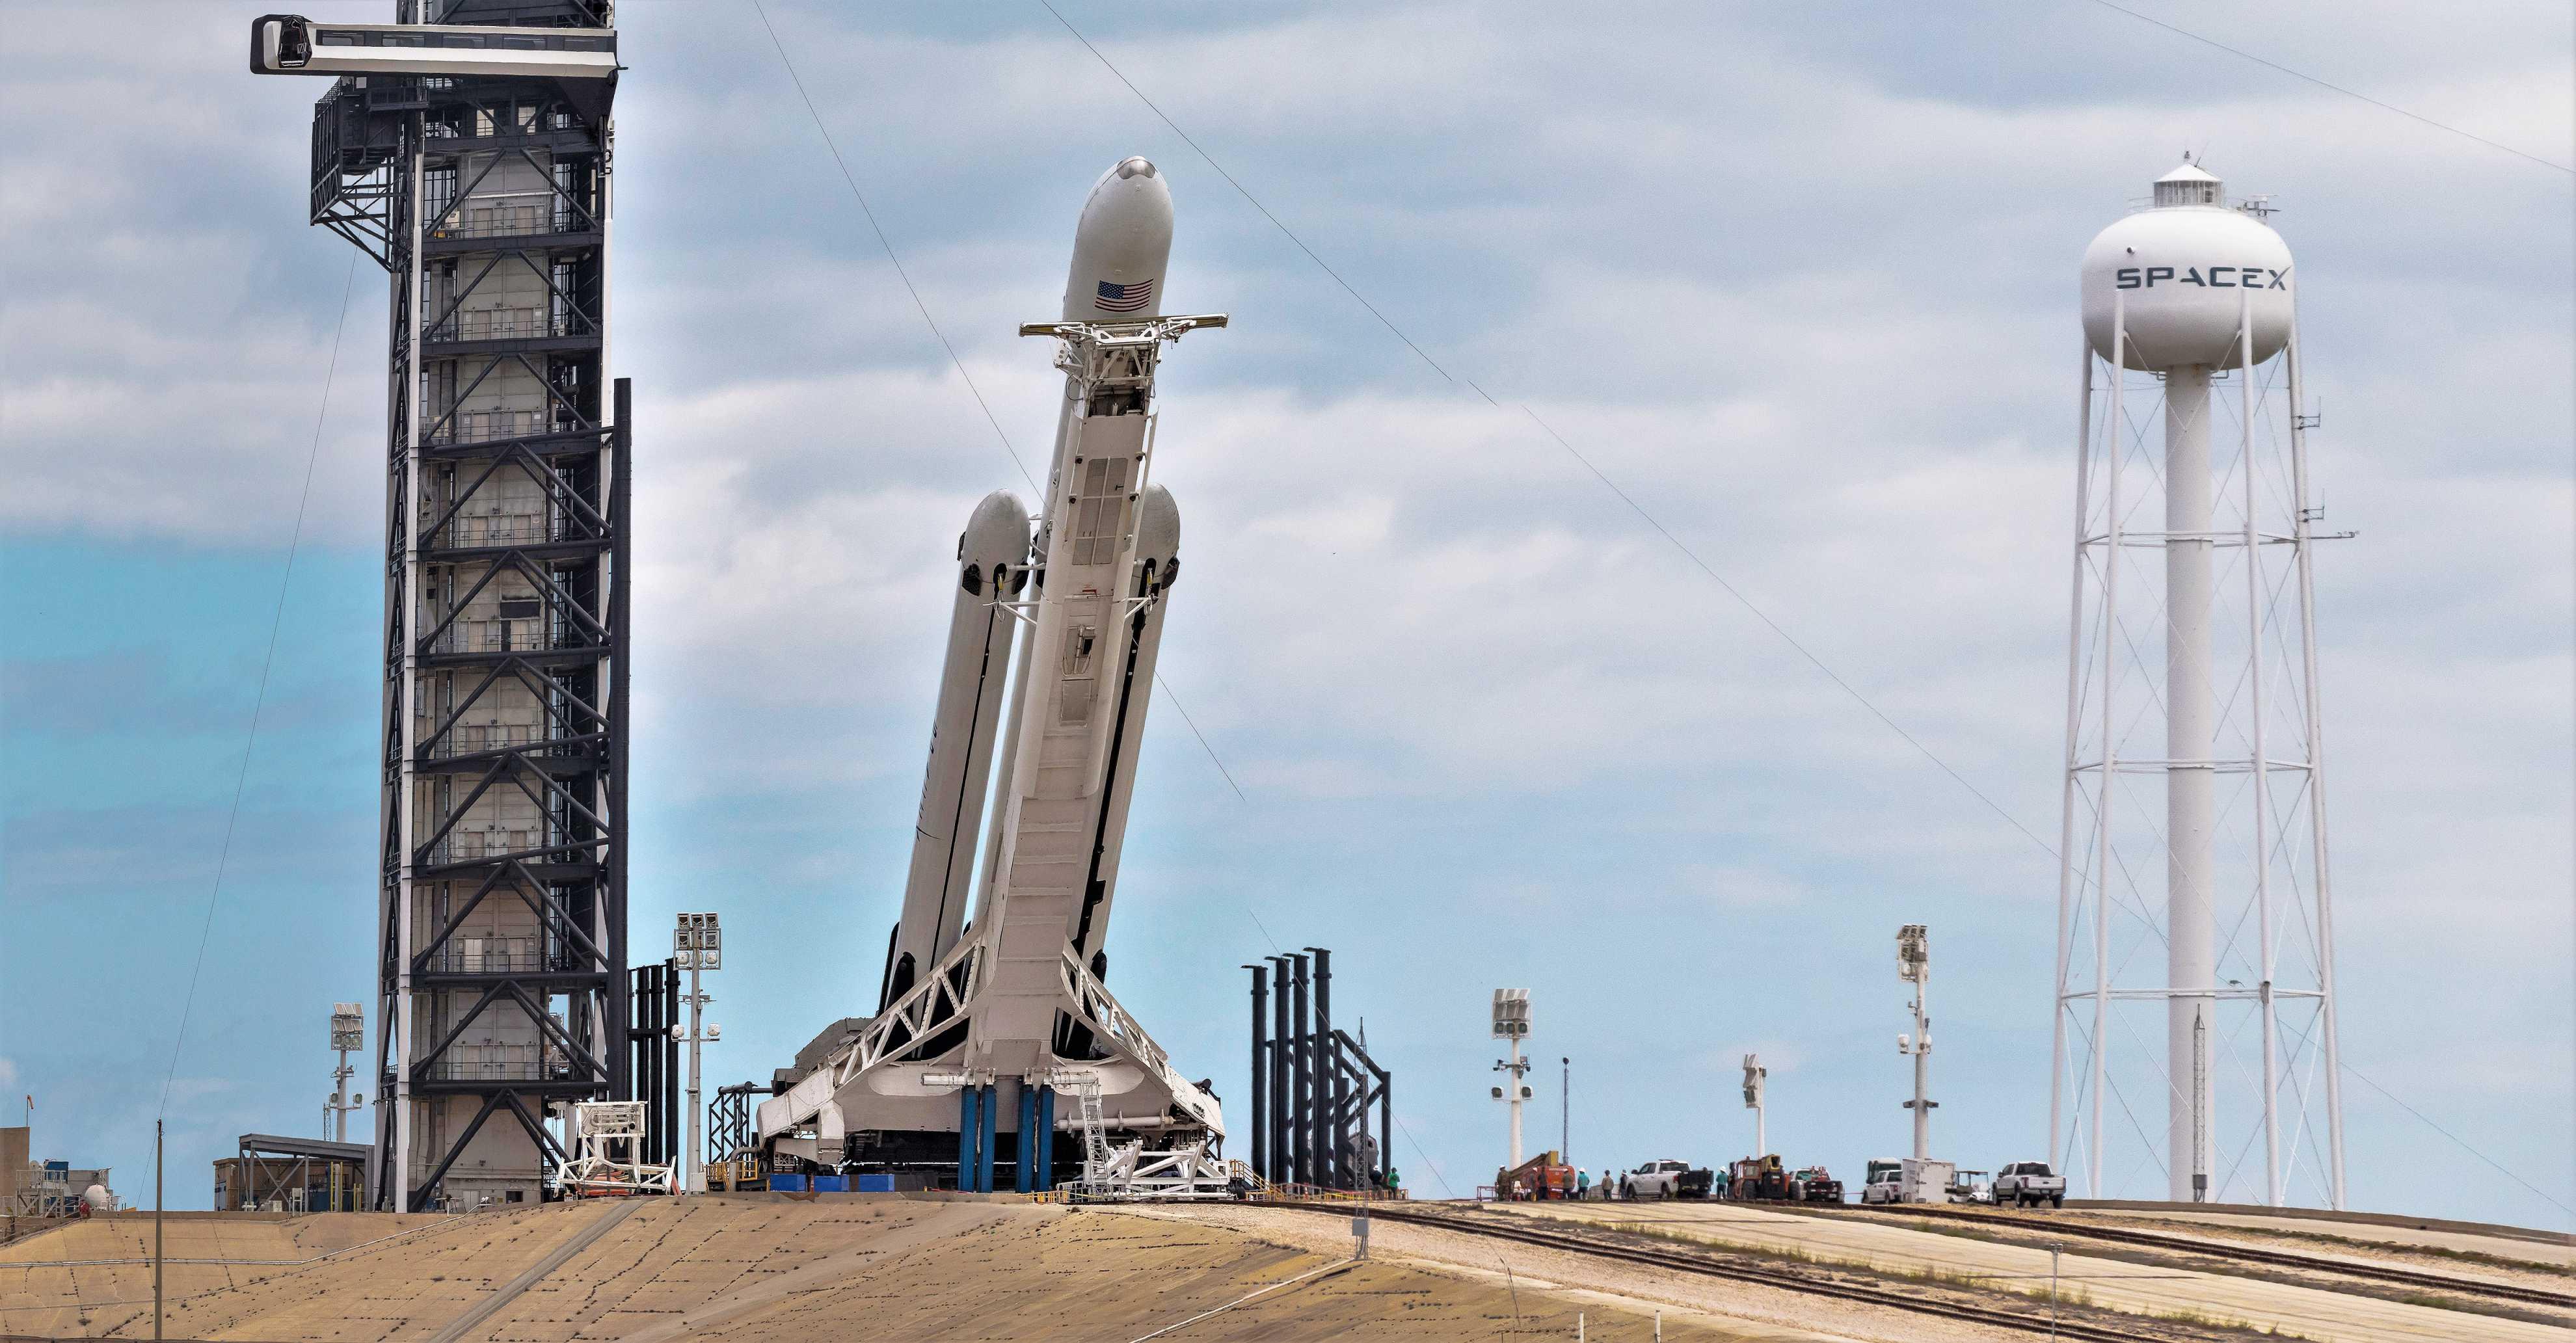 Falcon Heavy Flight 2 prelaunch 39A (Pauline Acalin) pano 4 edit (c)